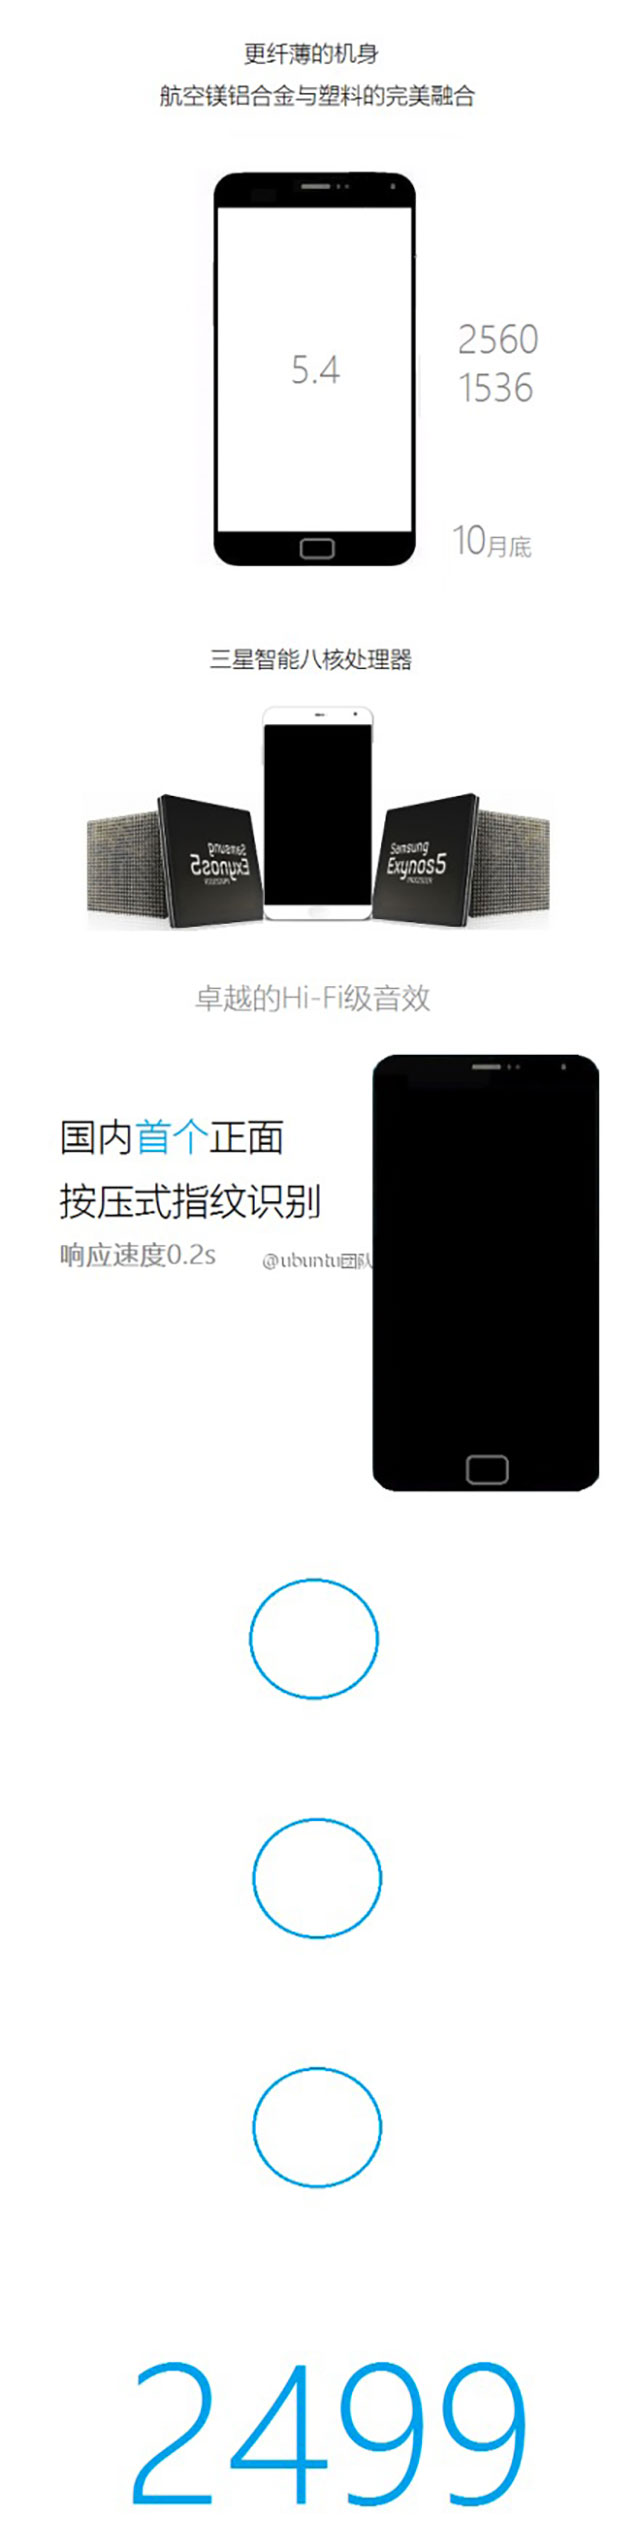 Meizu MX4 Pro : image 2